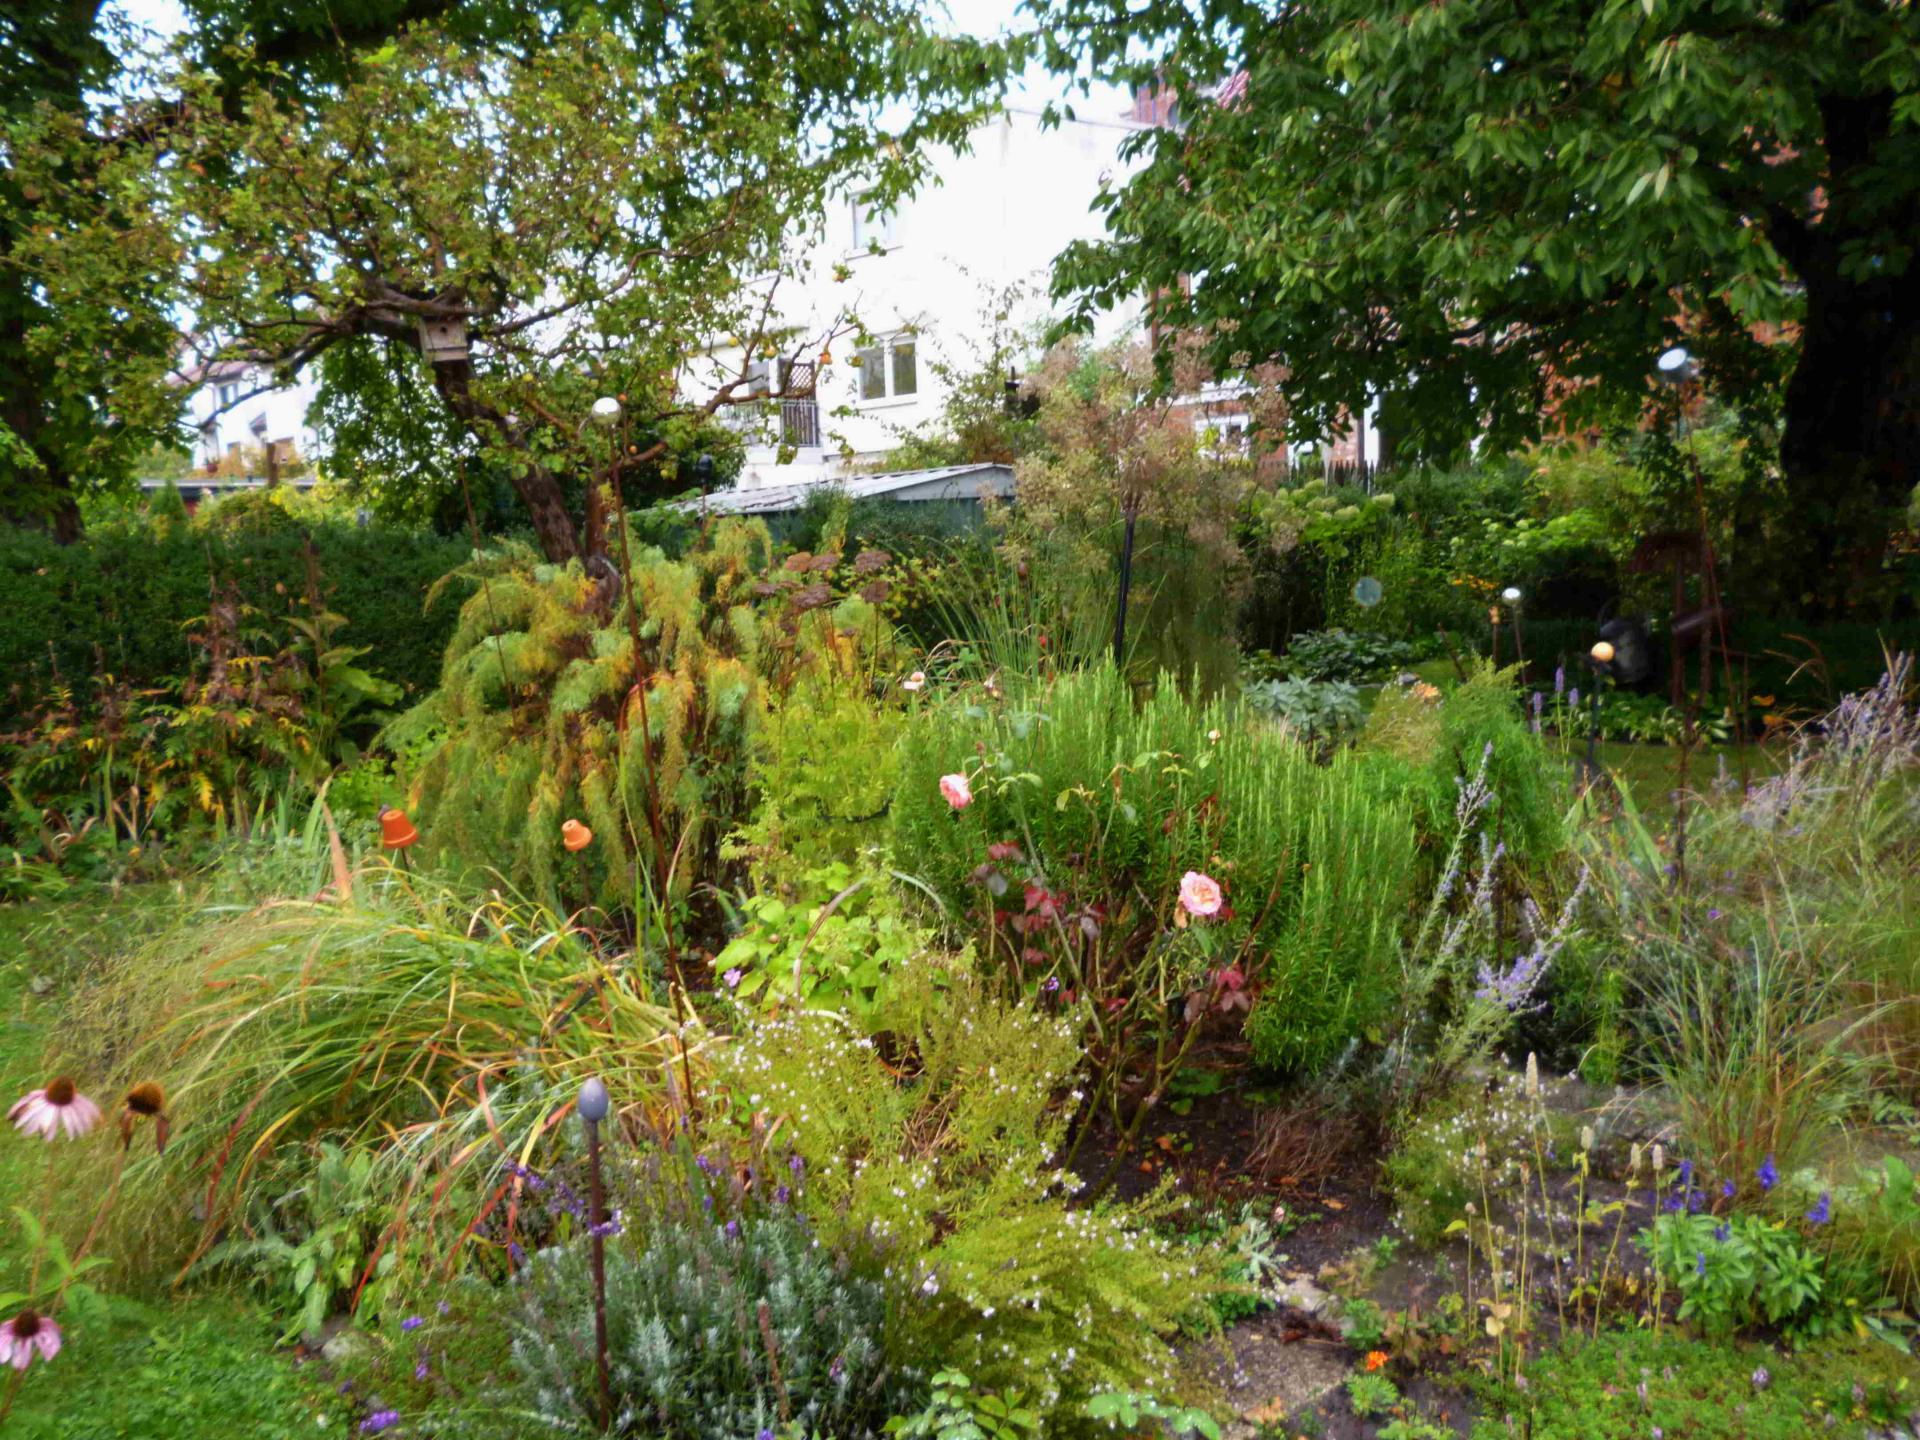 Offene Gartenpfporte 26-09-2020 Bild 06